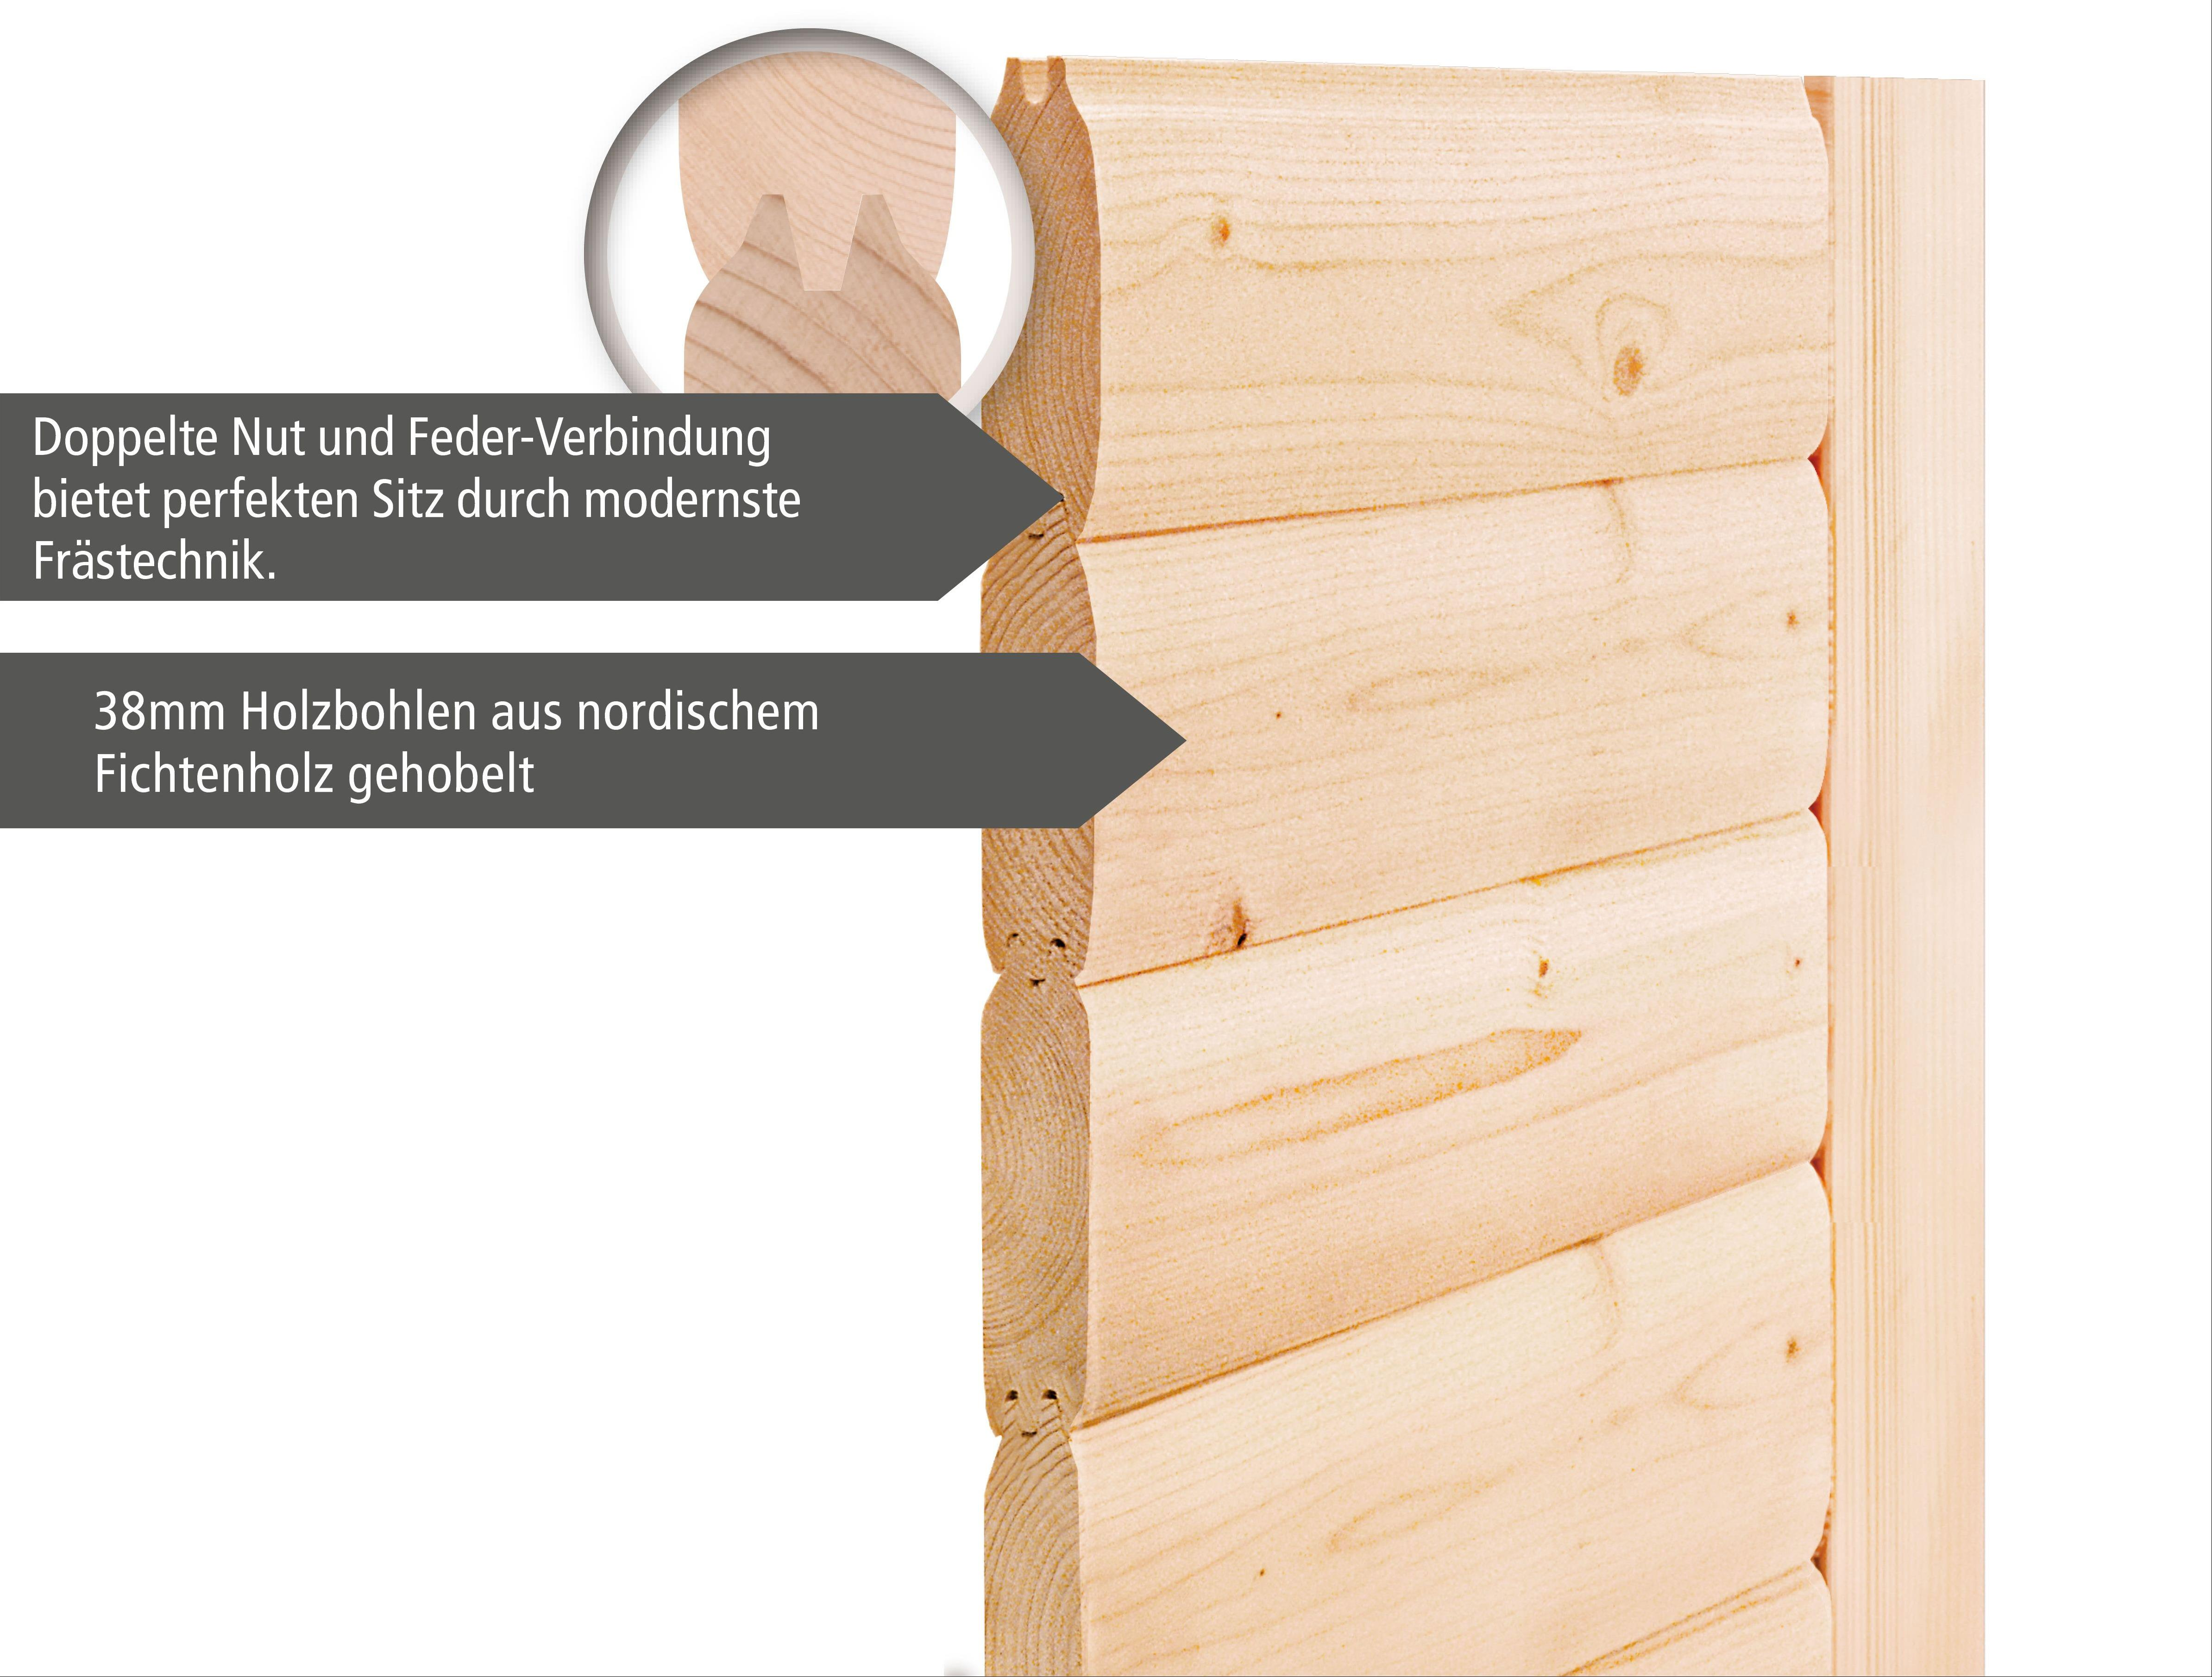 WoodFeeling Sauna Svea 38mm mit Saunaofen 9kW extern Dachkranz Holztür Bild 5